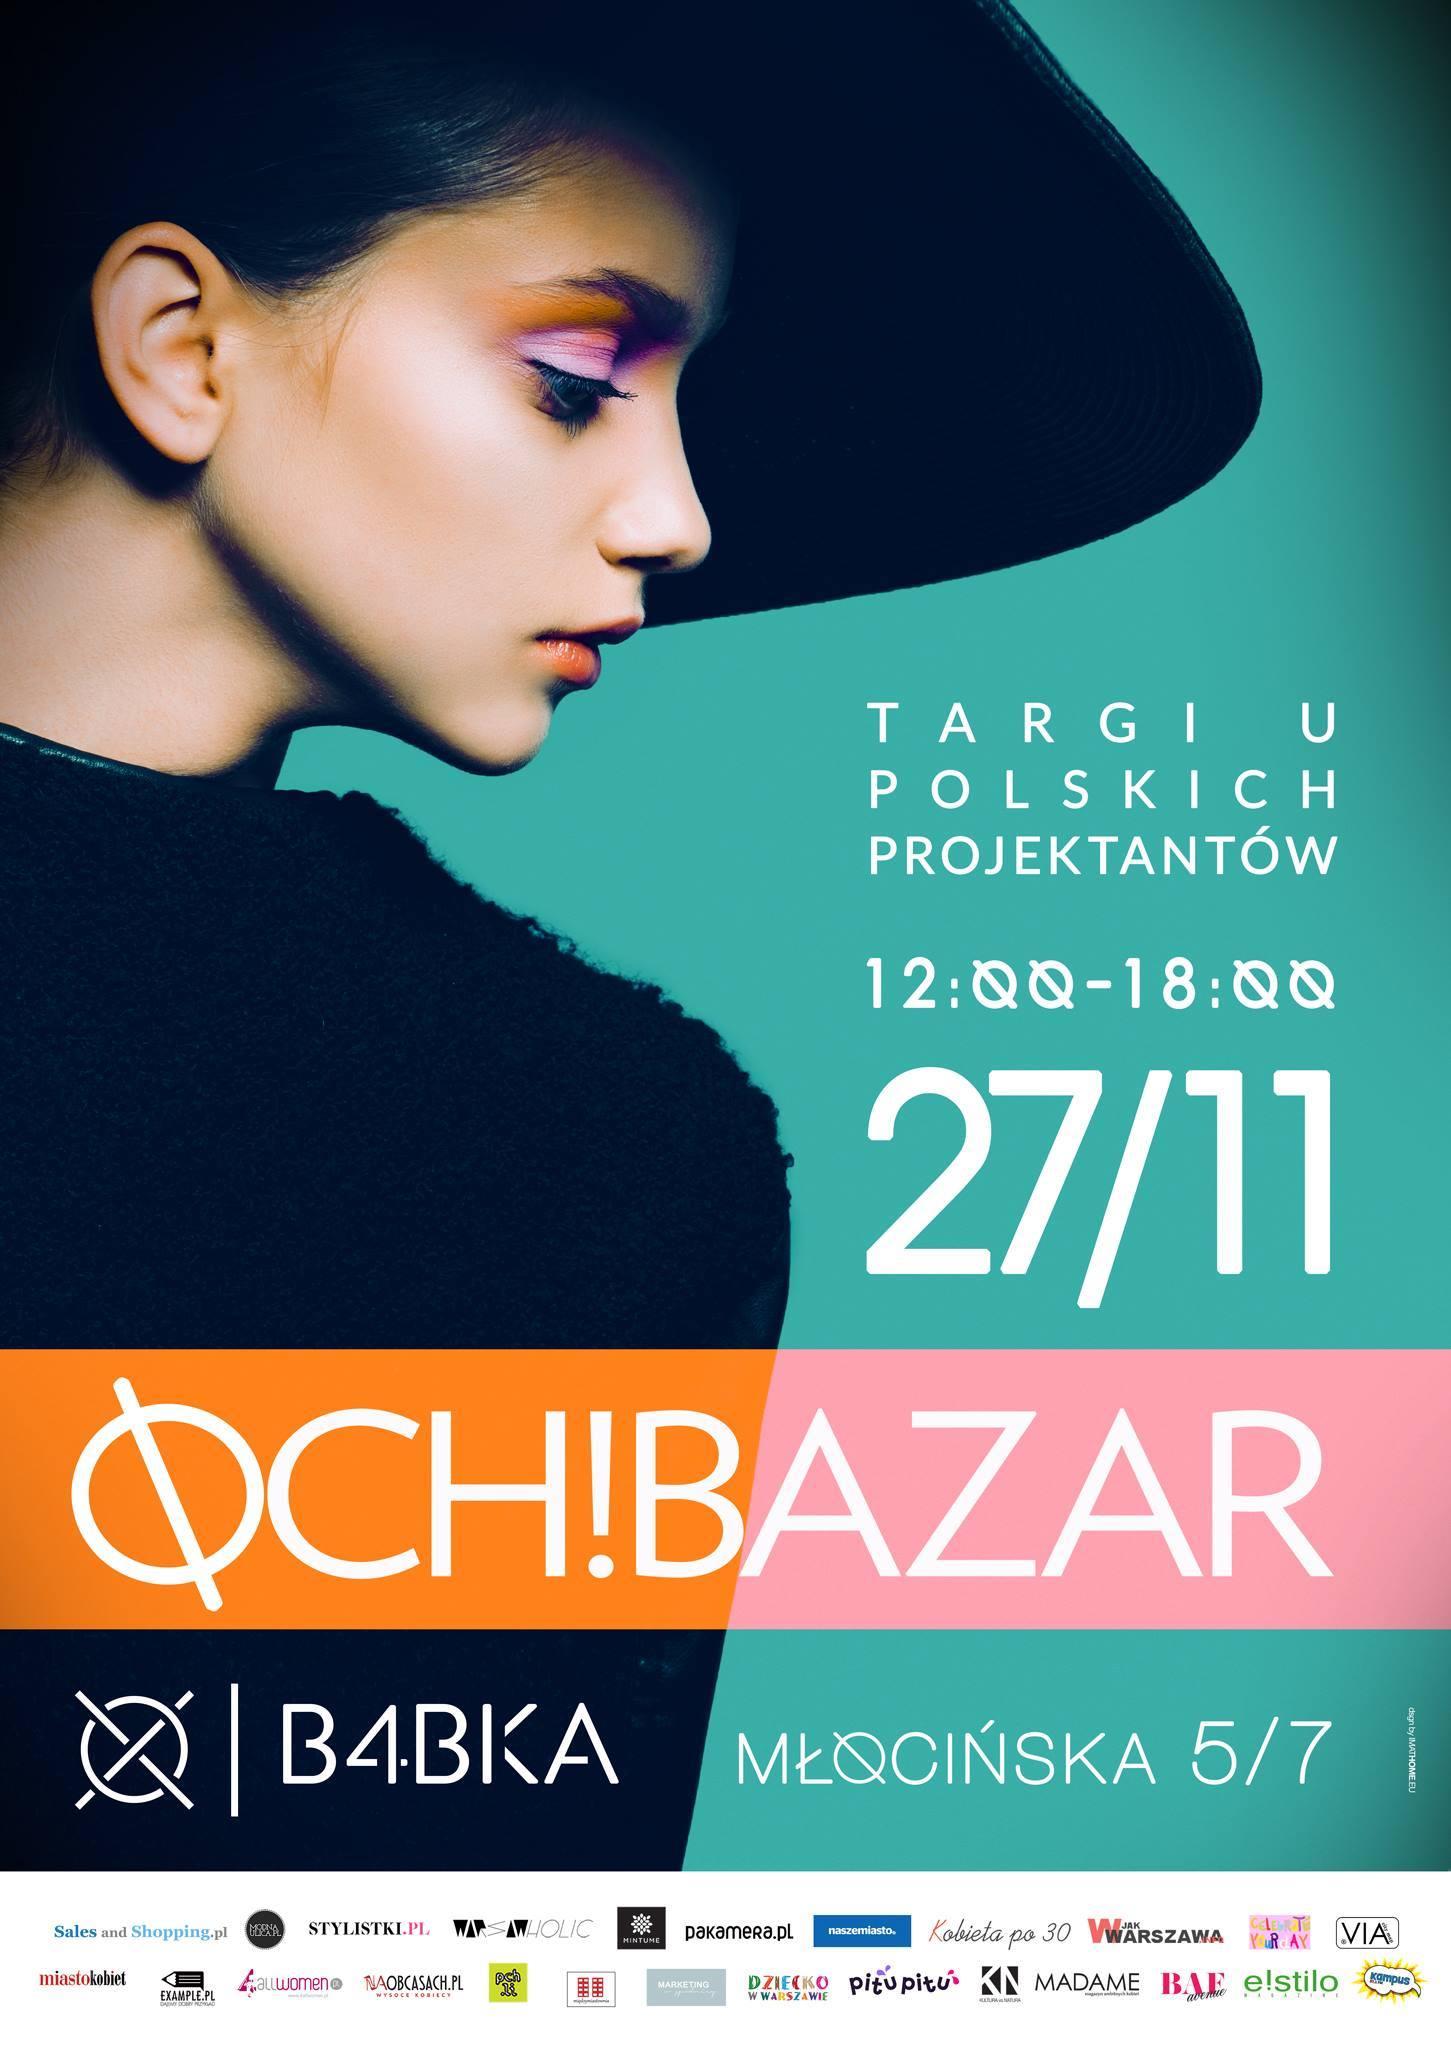 Targi mody i designu Och! Bazar Warszawa 27 listopada 2016